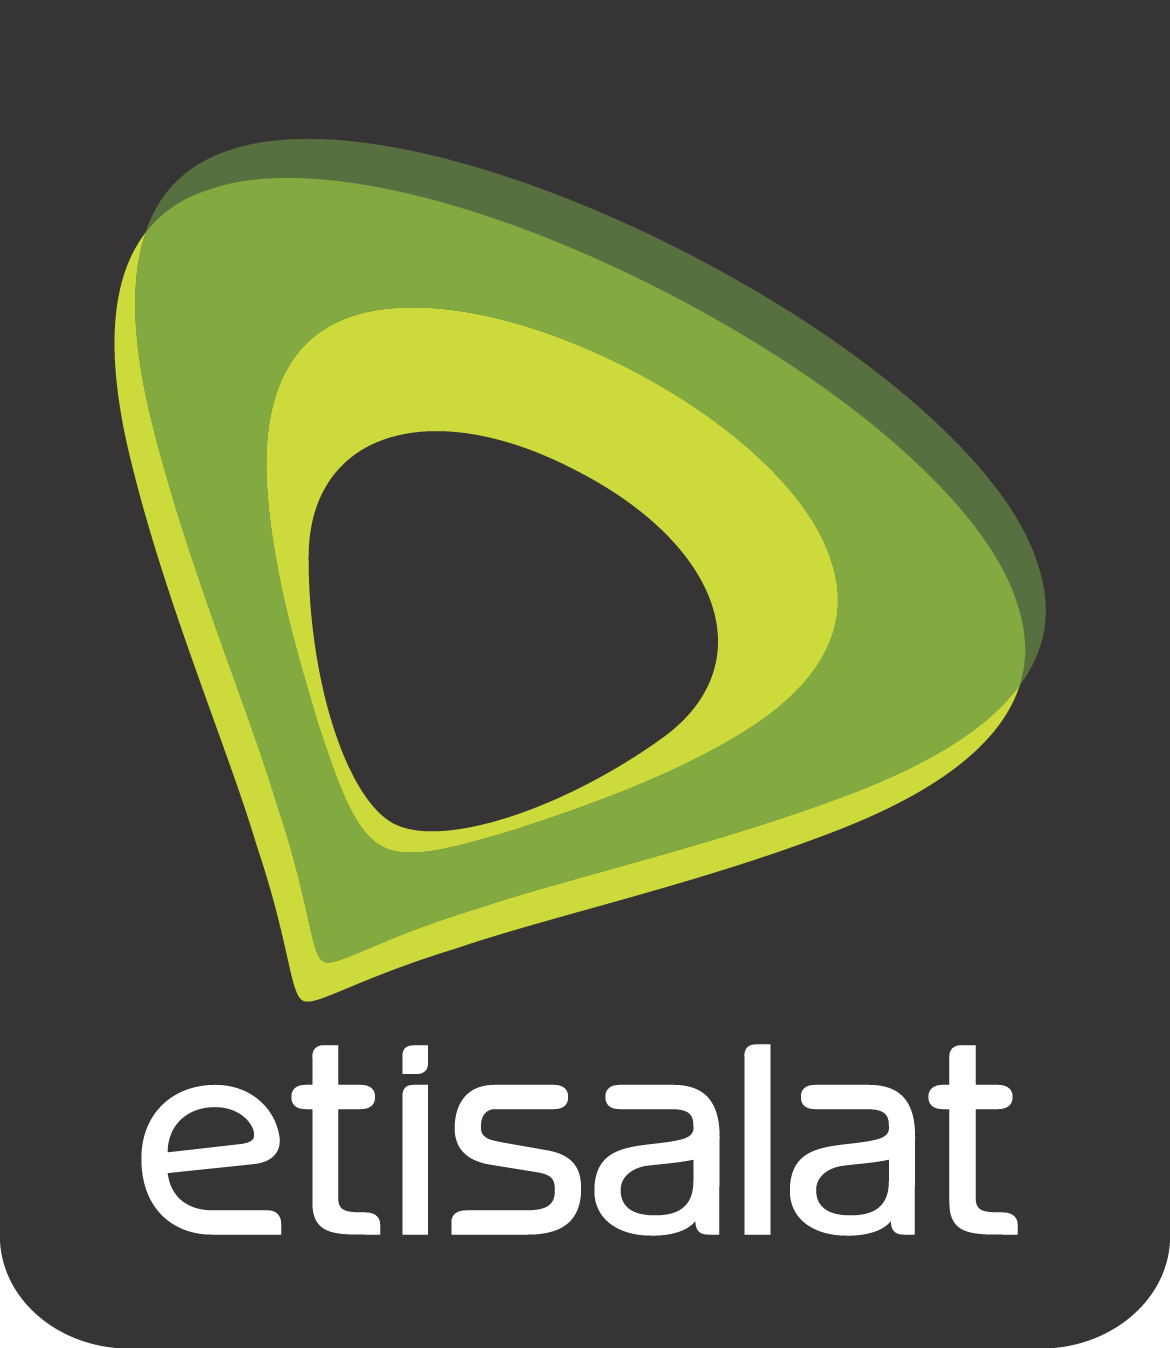 etisalat logo pngsvg logo vector template free